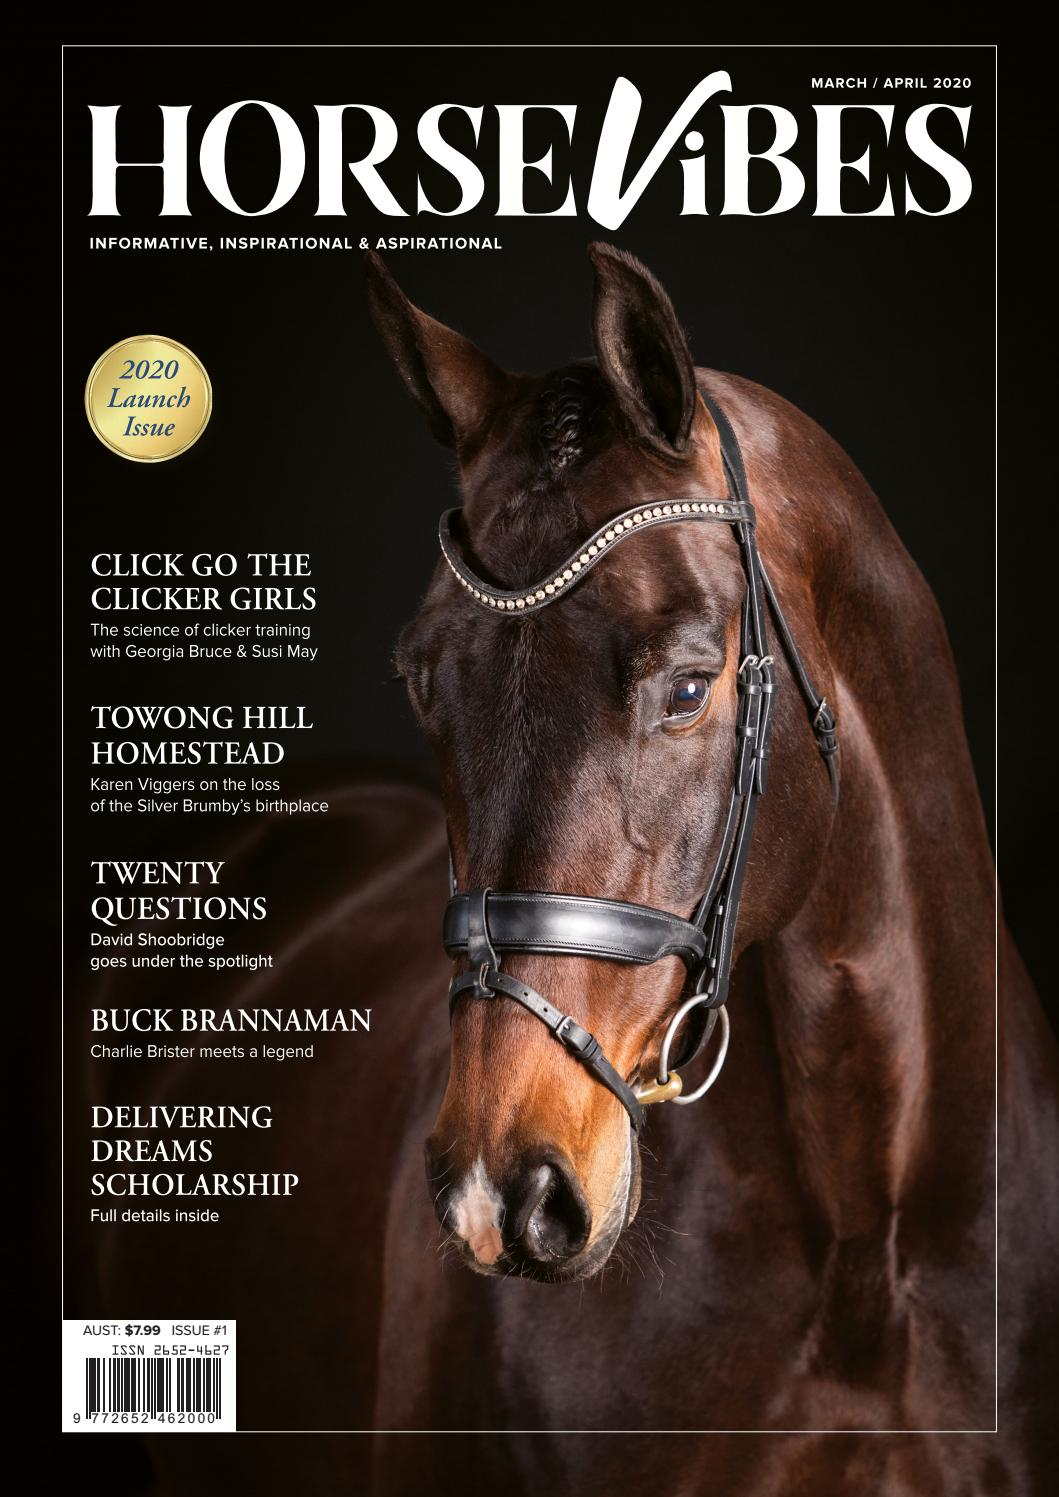 Brown draft horse Australian halter bridle with European style rubber grip reins